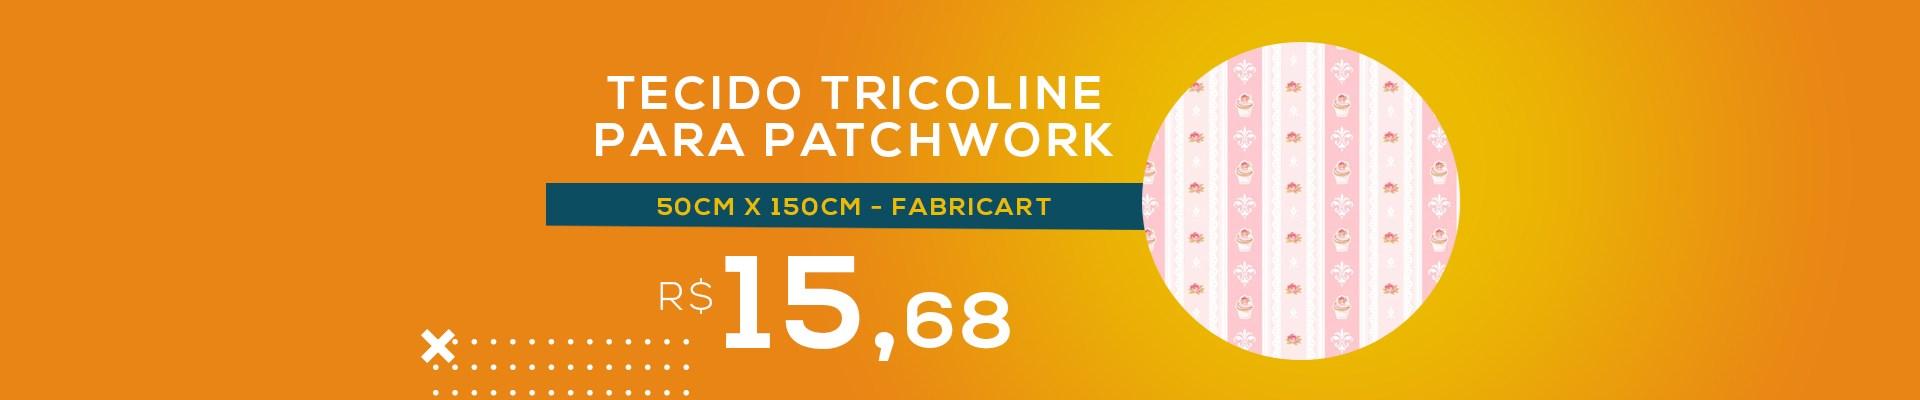 Tecido Tricoline Para Patchwork - 8312 - Cupcake Lace Rosa Cotton - 50cm x 150cm - Fabricart